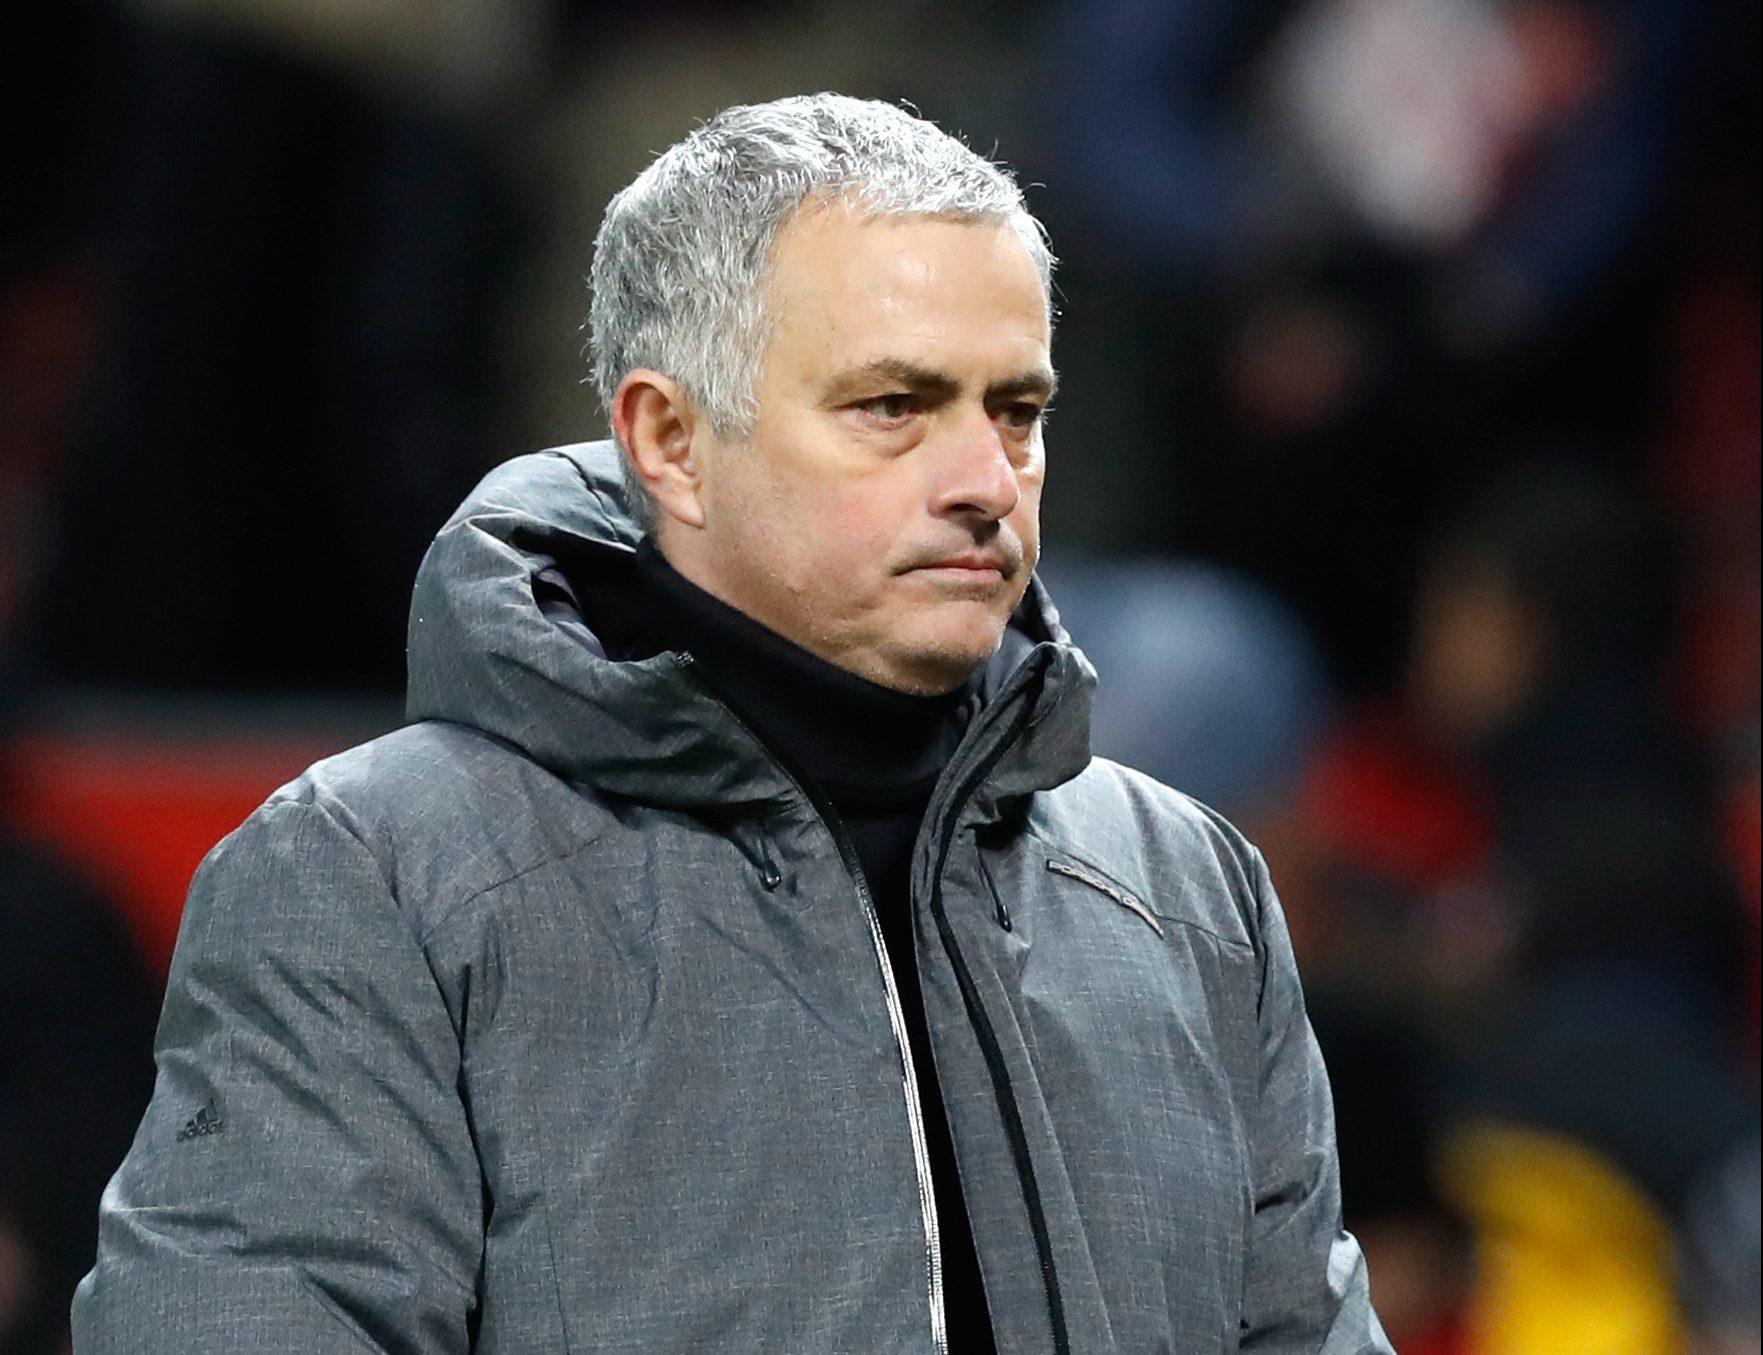 Manchester United manager Jose Mourinho. (Martin Rickett/PA Wire)